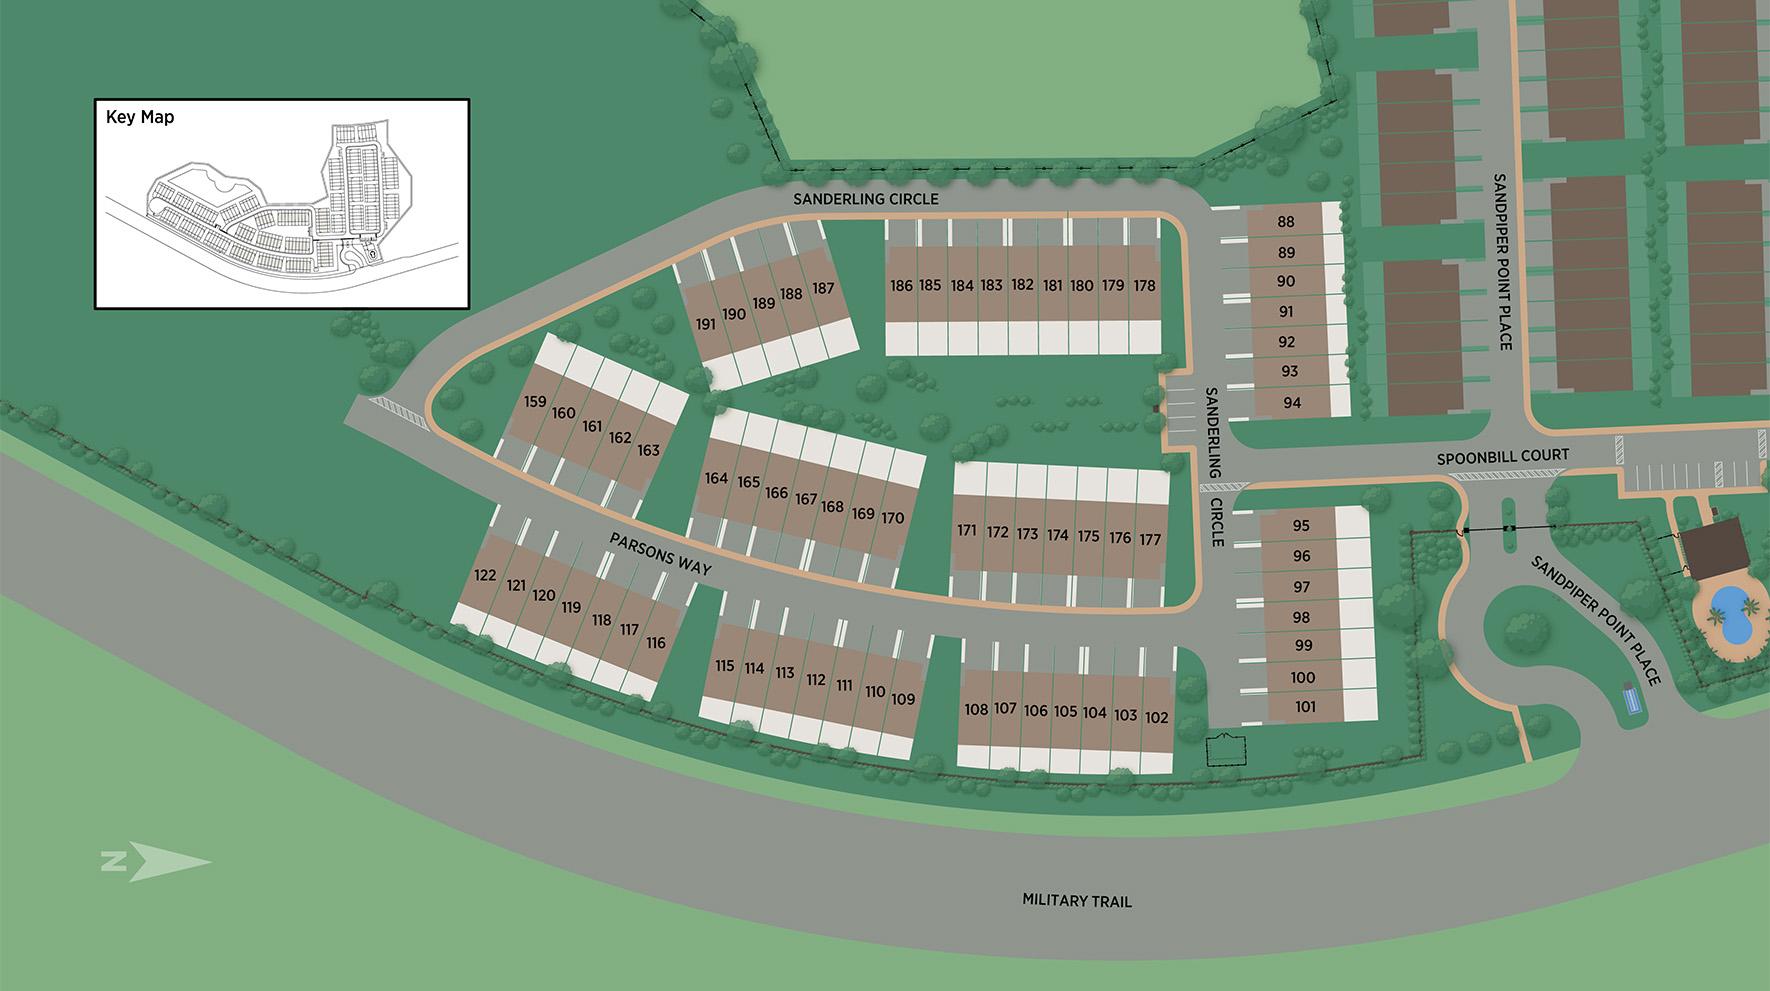 Sandpiper Pointe at Deerfield Beach Phase 2 Site Plan